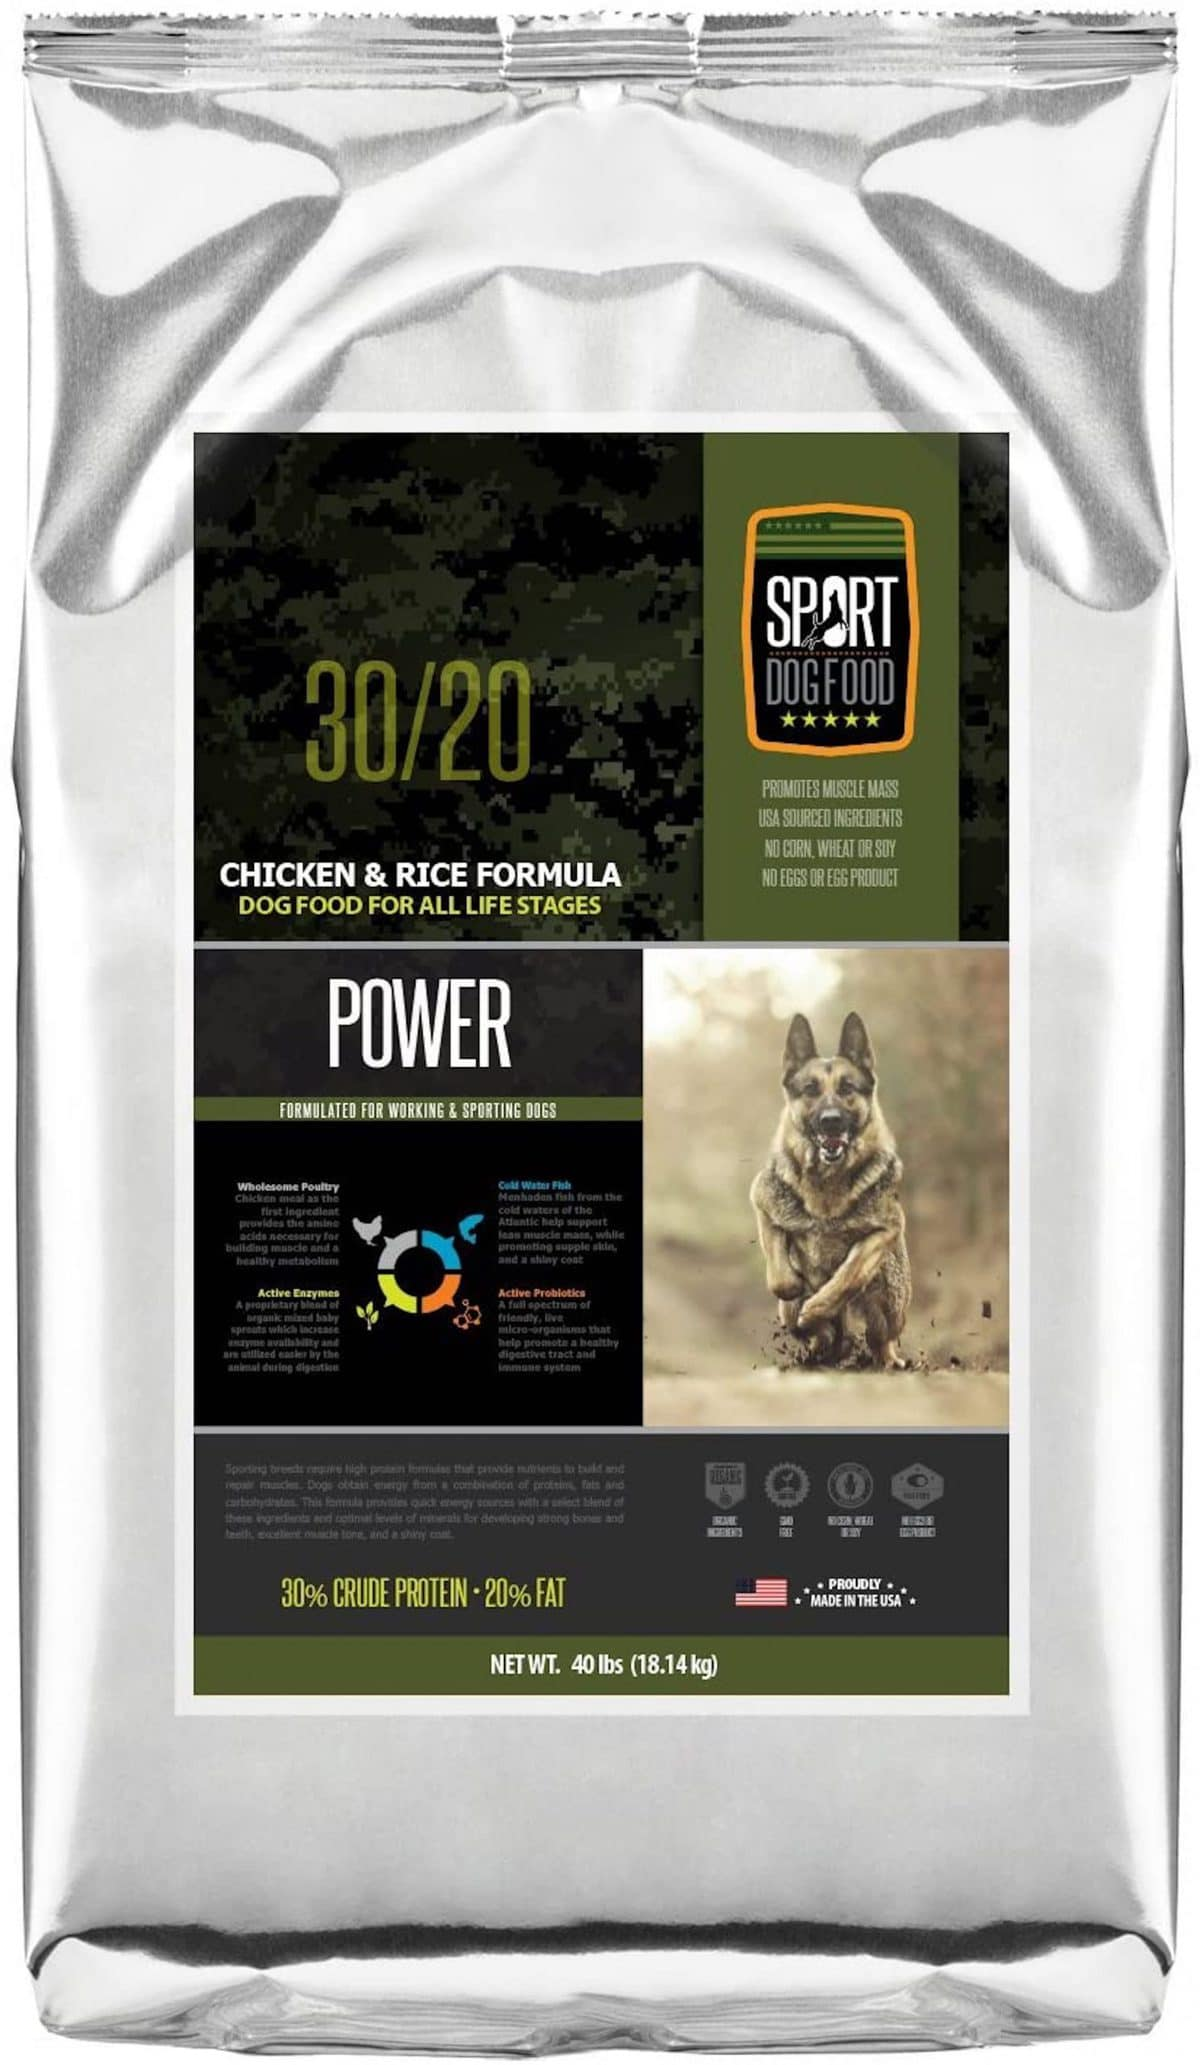 SportDogFood Canine Athlete Formula Dog Food